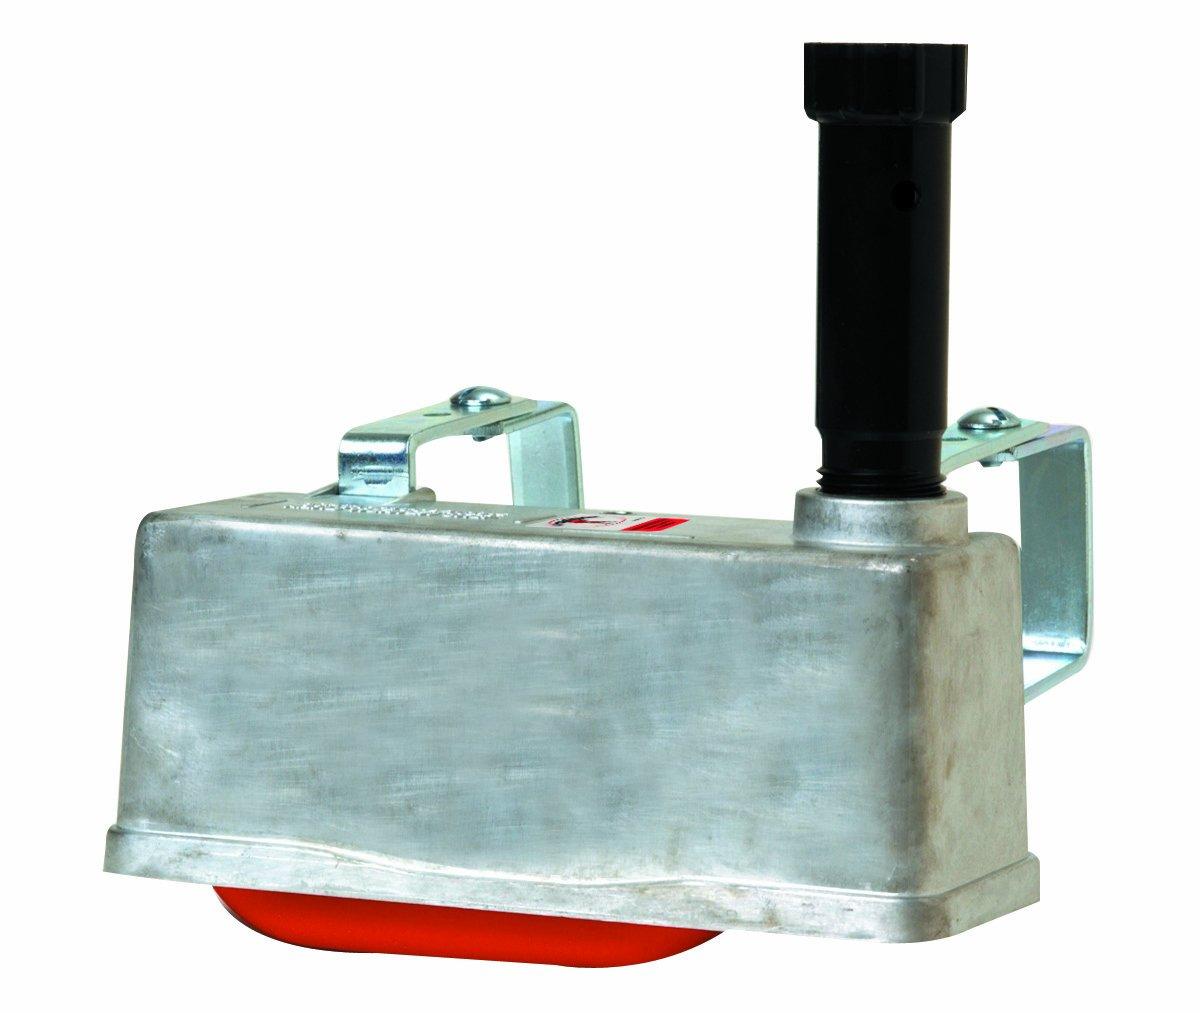 LITTLE GIANT Trough-O-Matic (Metal, Anti-Siphon)